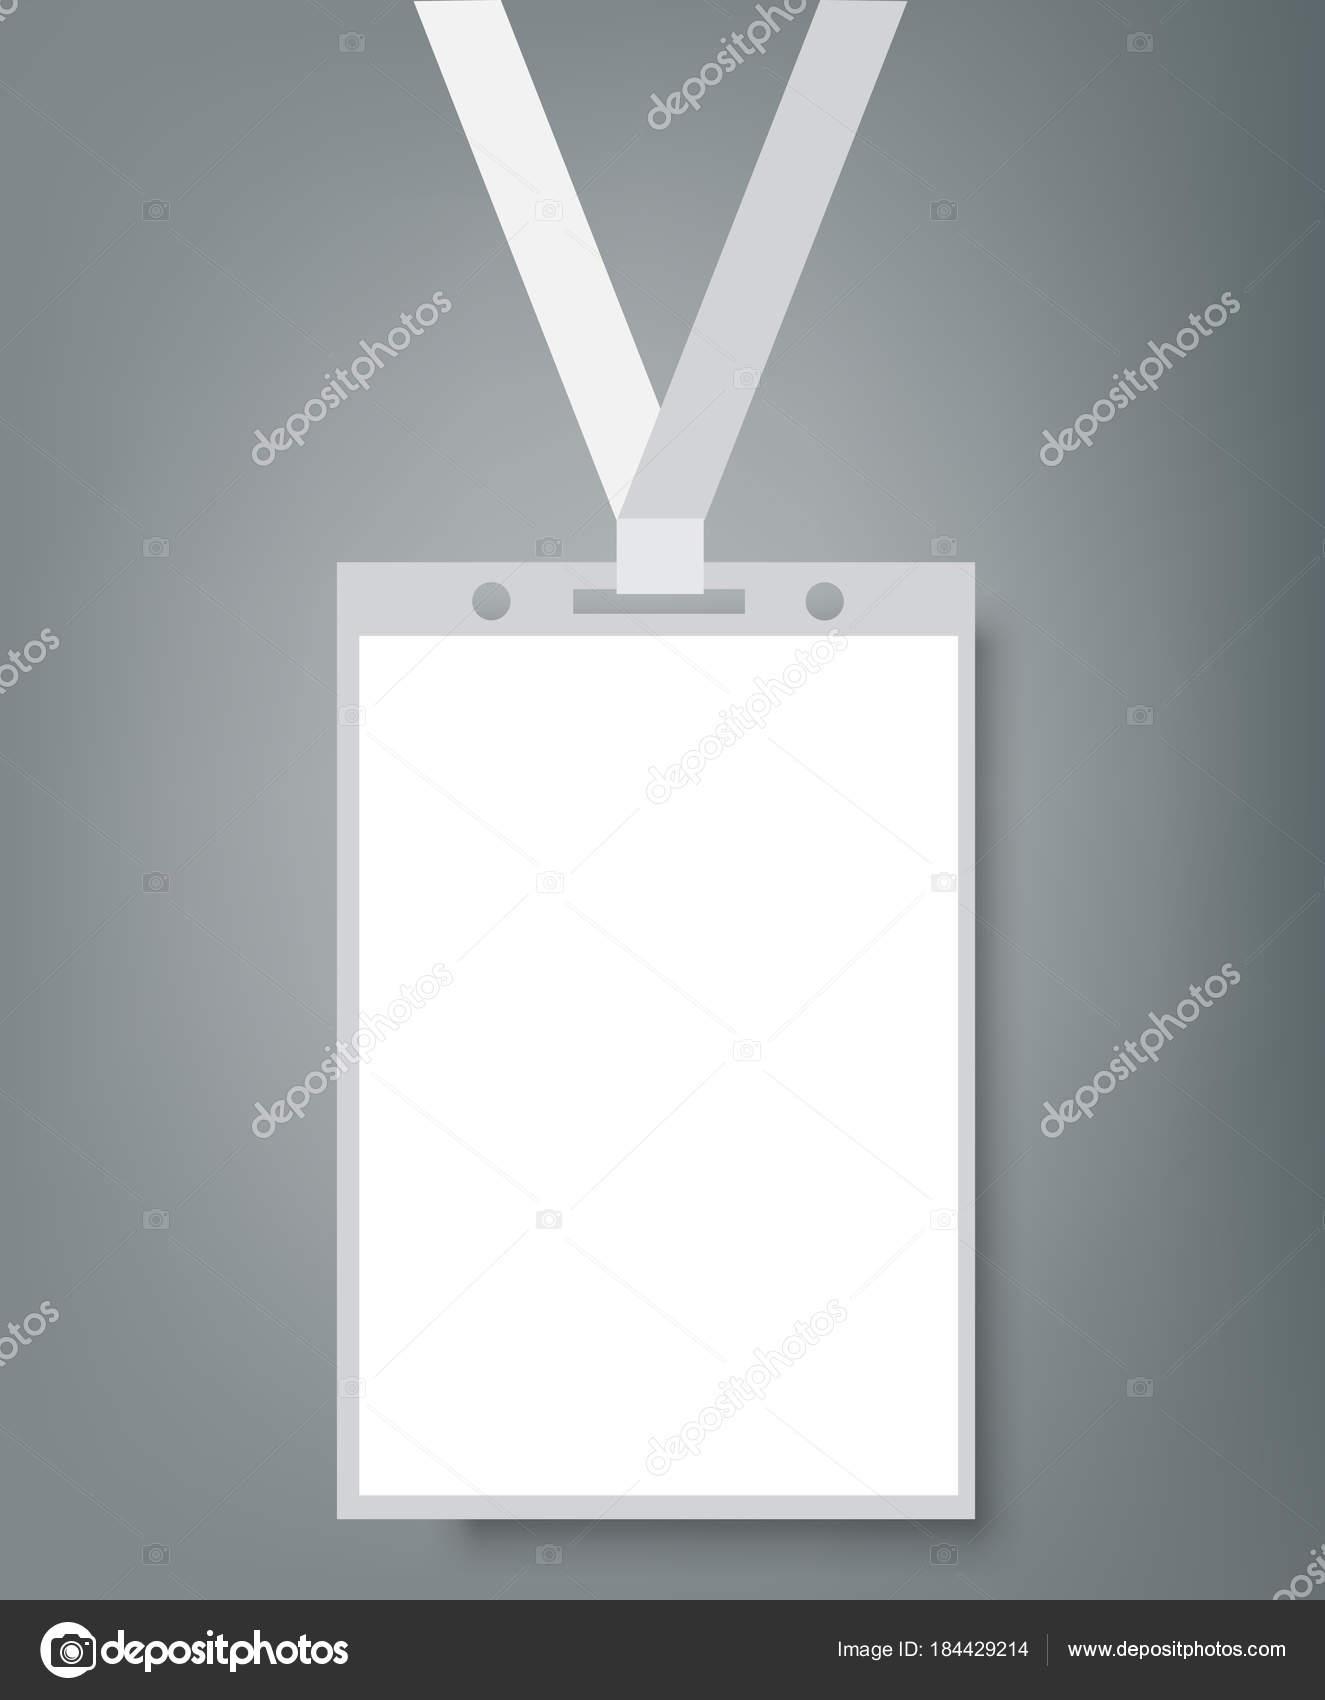 Blank Name Tags Mockup. Vector Illustration of Identity Card Badge ...